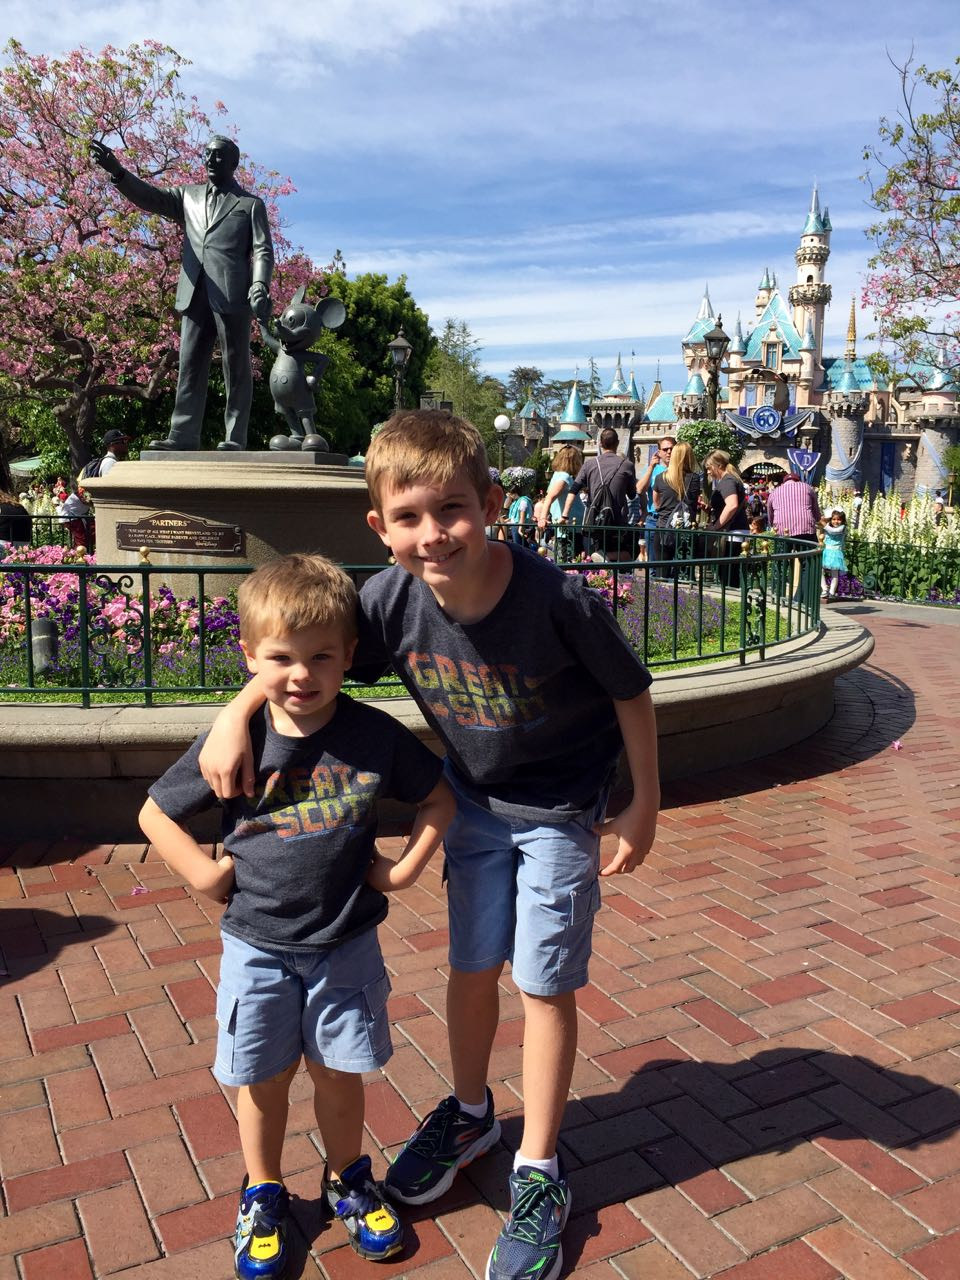 Partners Statue Disneyland Park